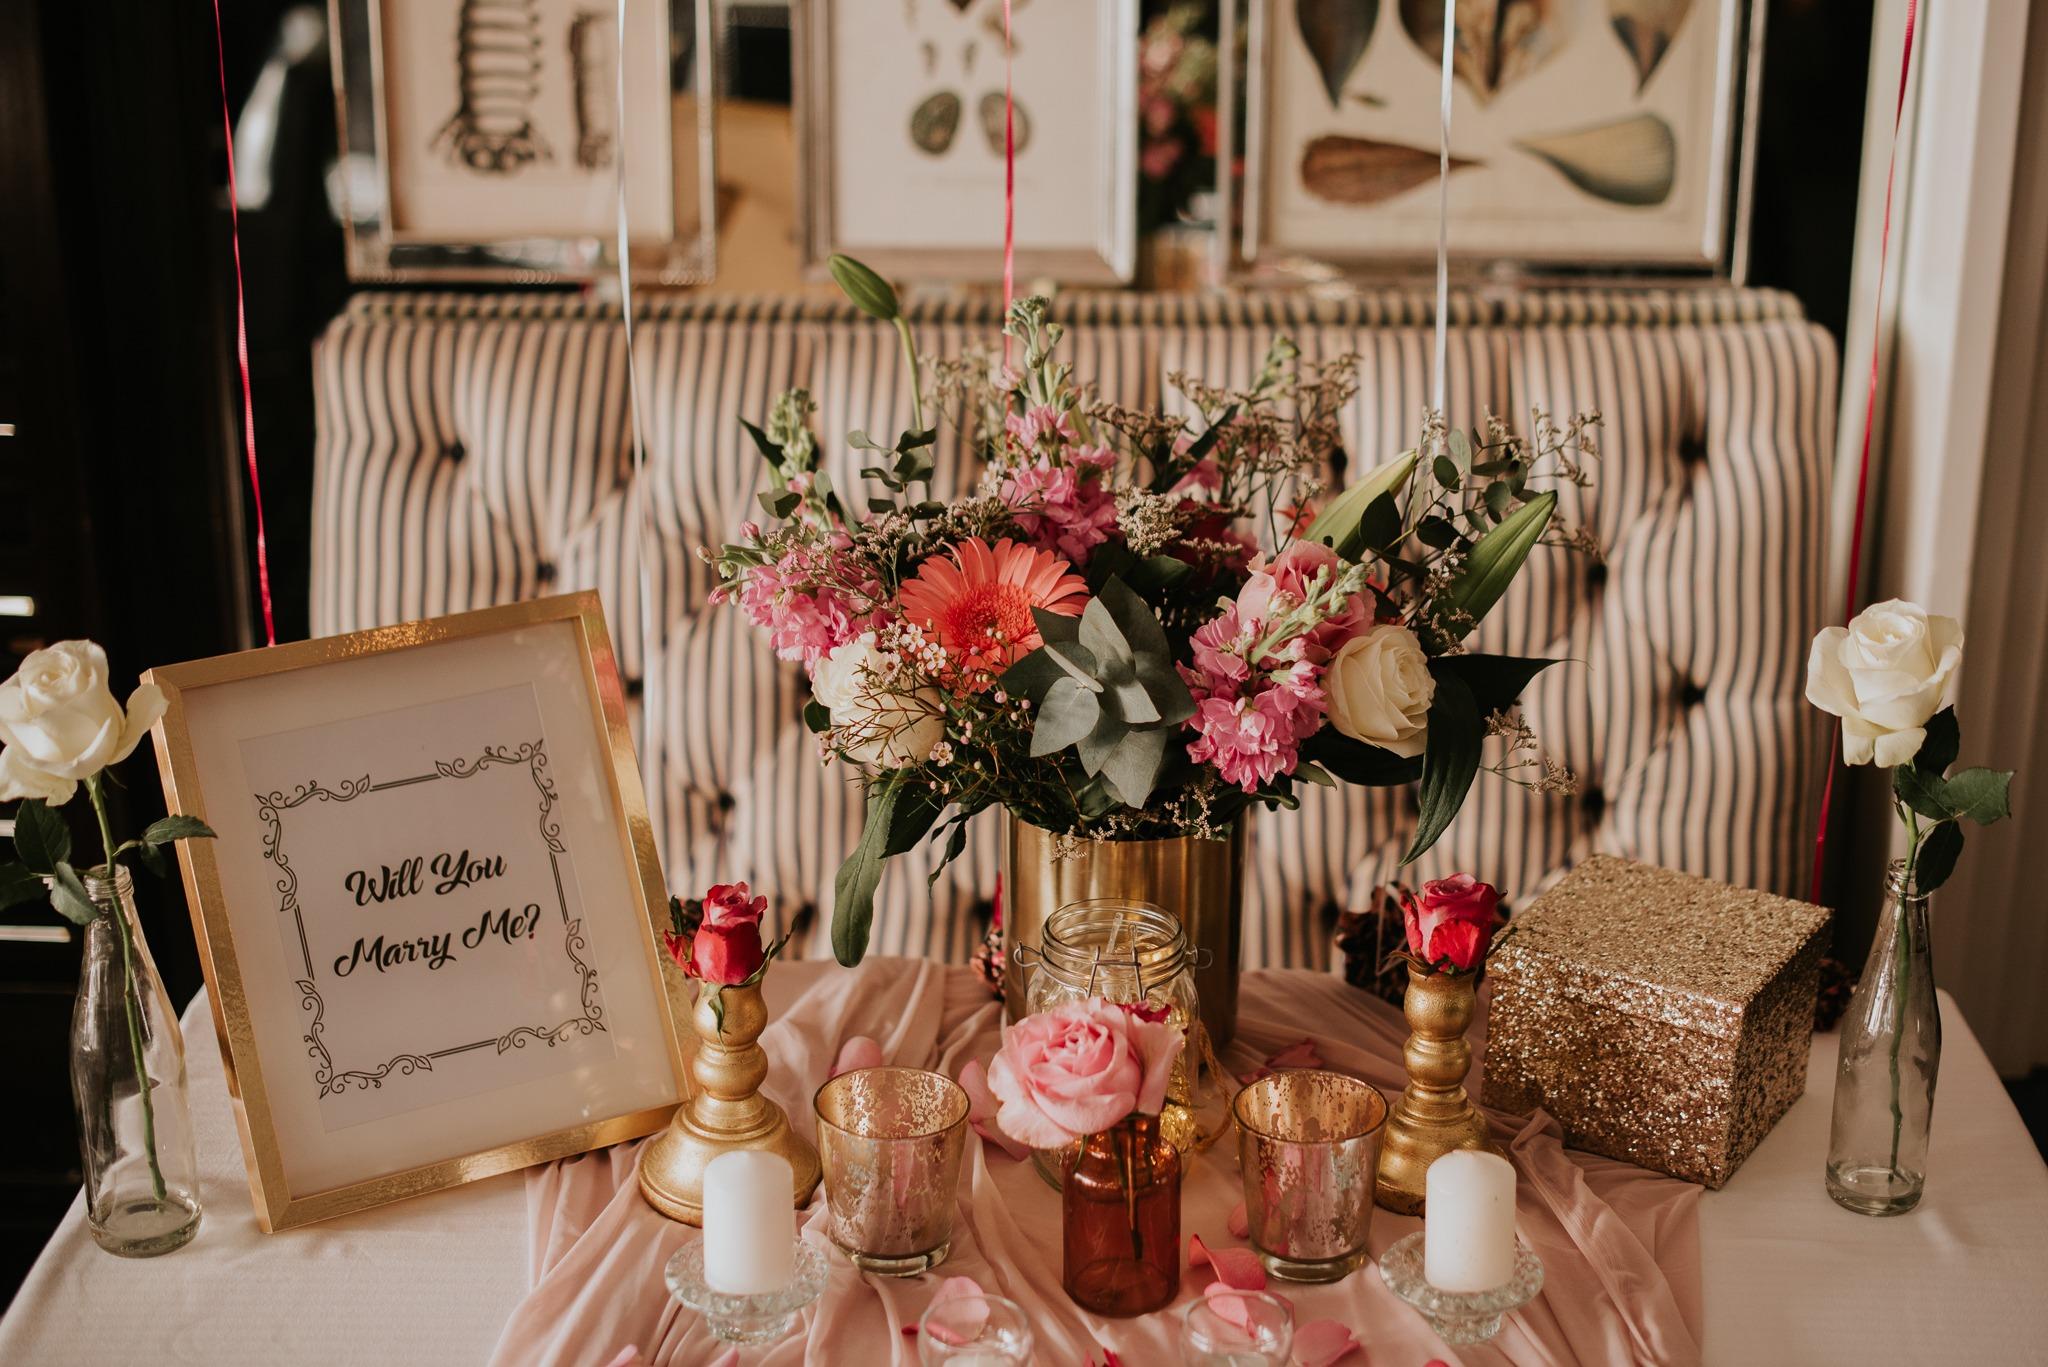 Restaurant marriage proposal